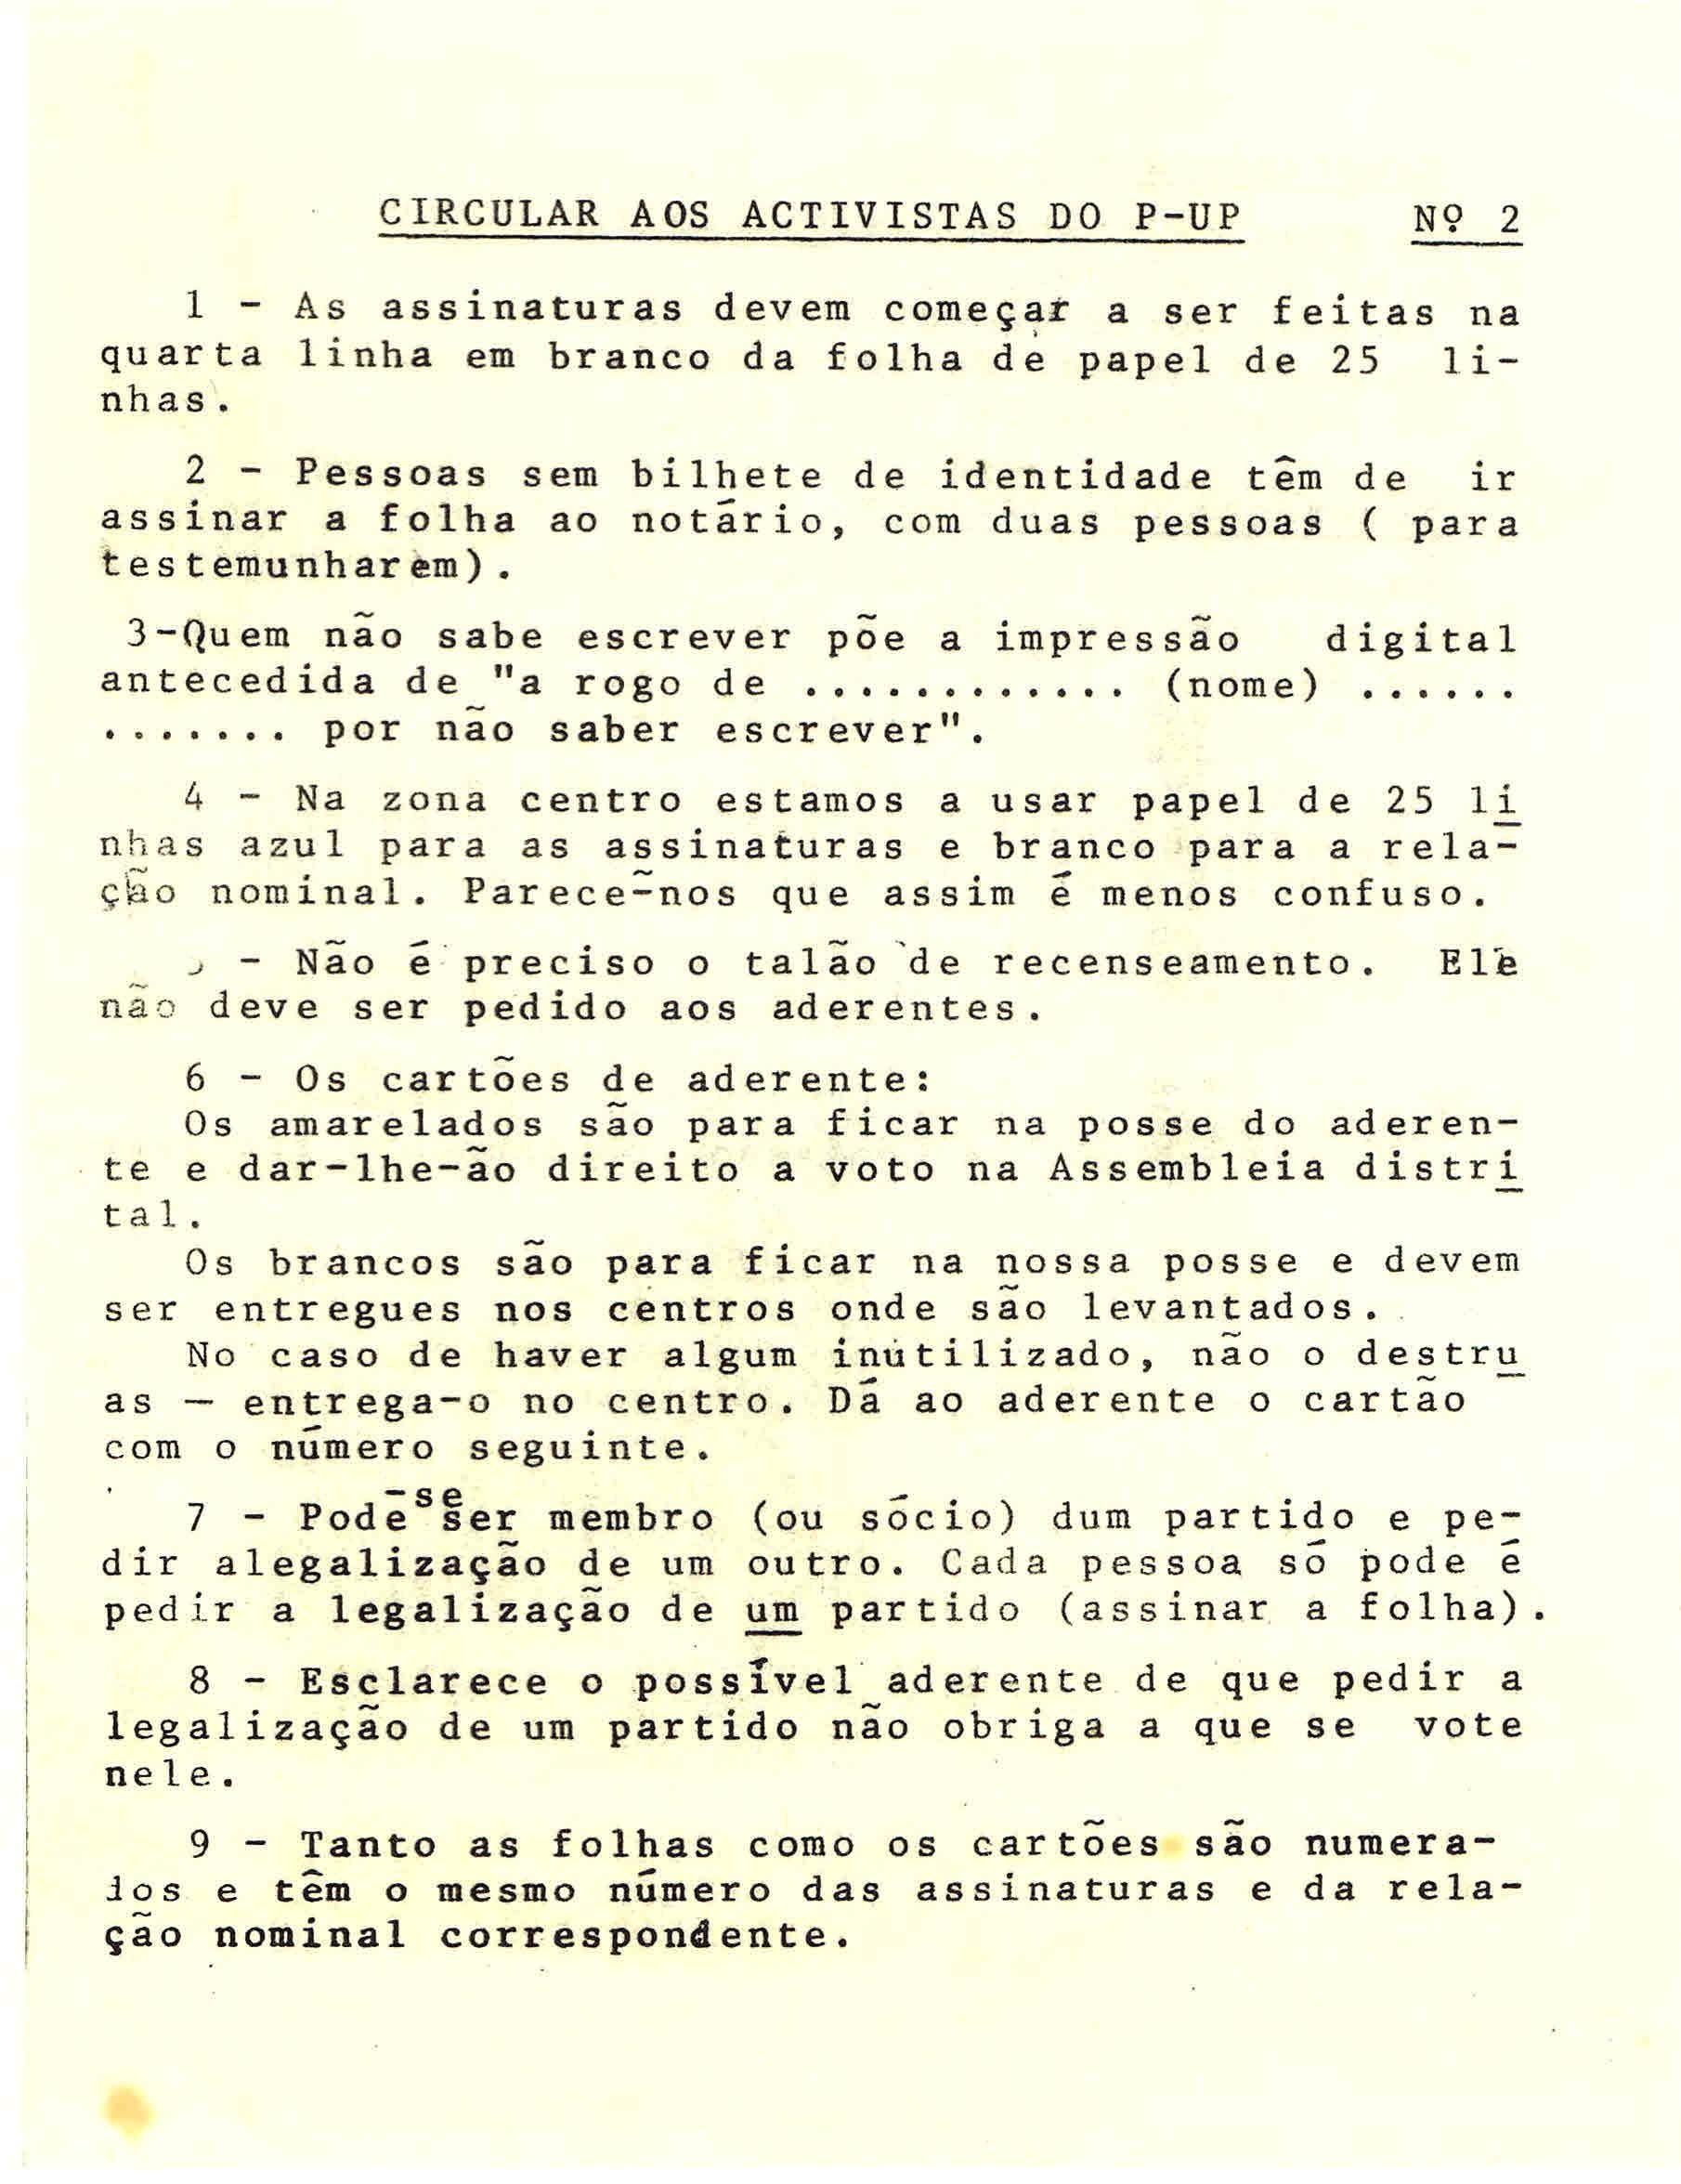 PARTIDO DE UNIDADE POPULAR – CIRCULARES CIRCULARES INTERNAS CIRCULARES PROCESSO ELEITORAL PARA A ASSEMBLEIA CONSTITUINTE 1975 – EPHEMERA – Biblioteca